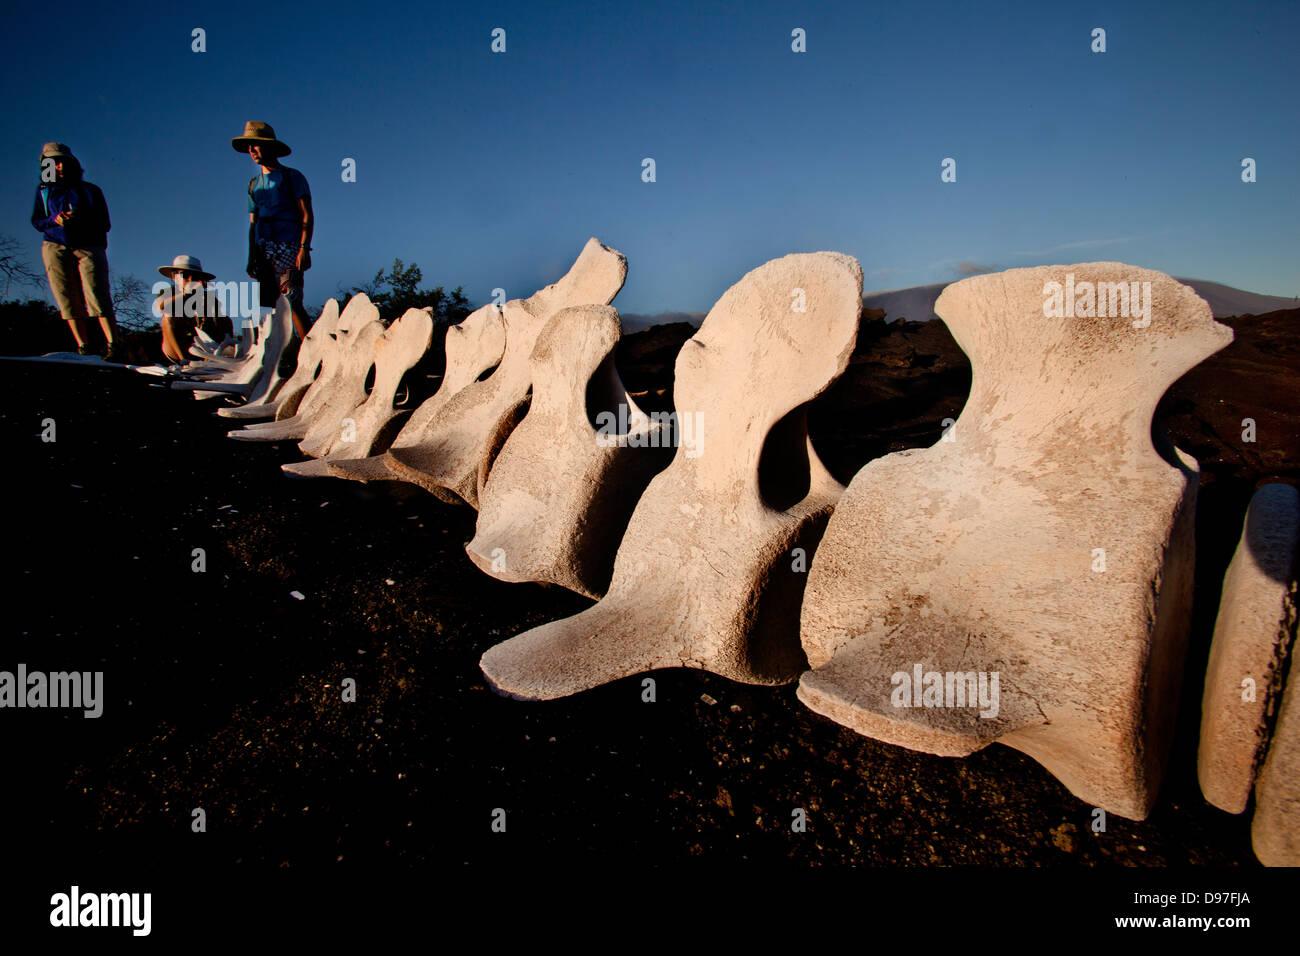 Bones of whale found on Punta Espinozo, Fernandina Island, Galapagos, Ecuador - Stock Image